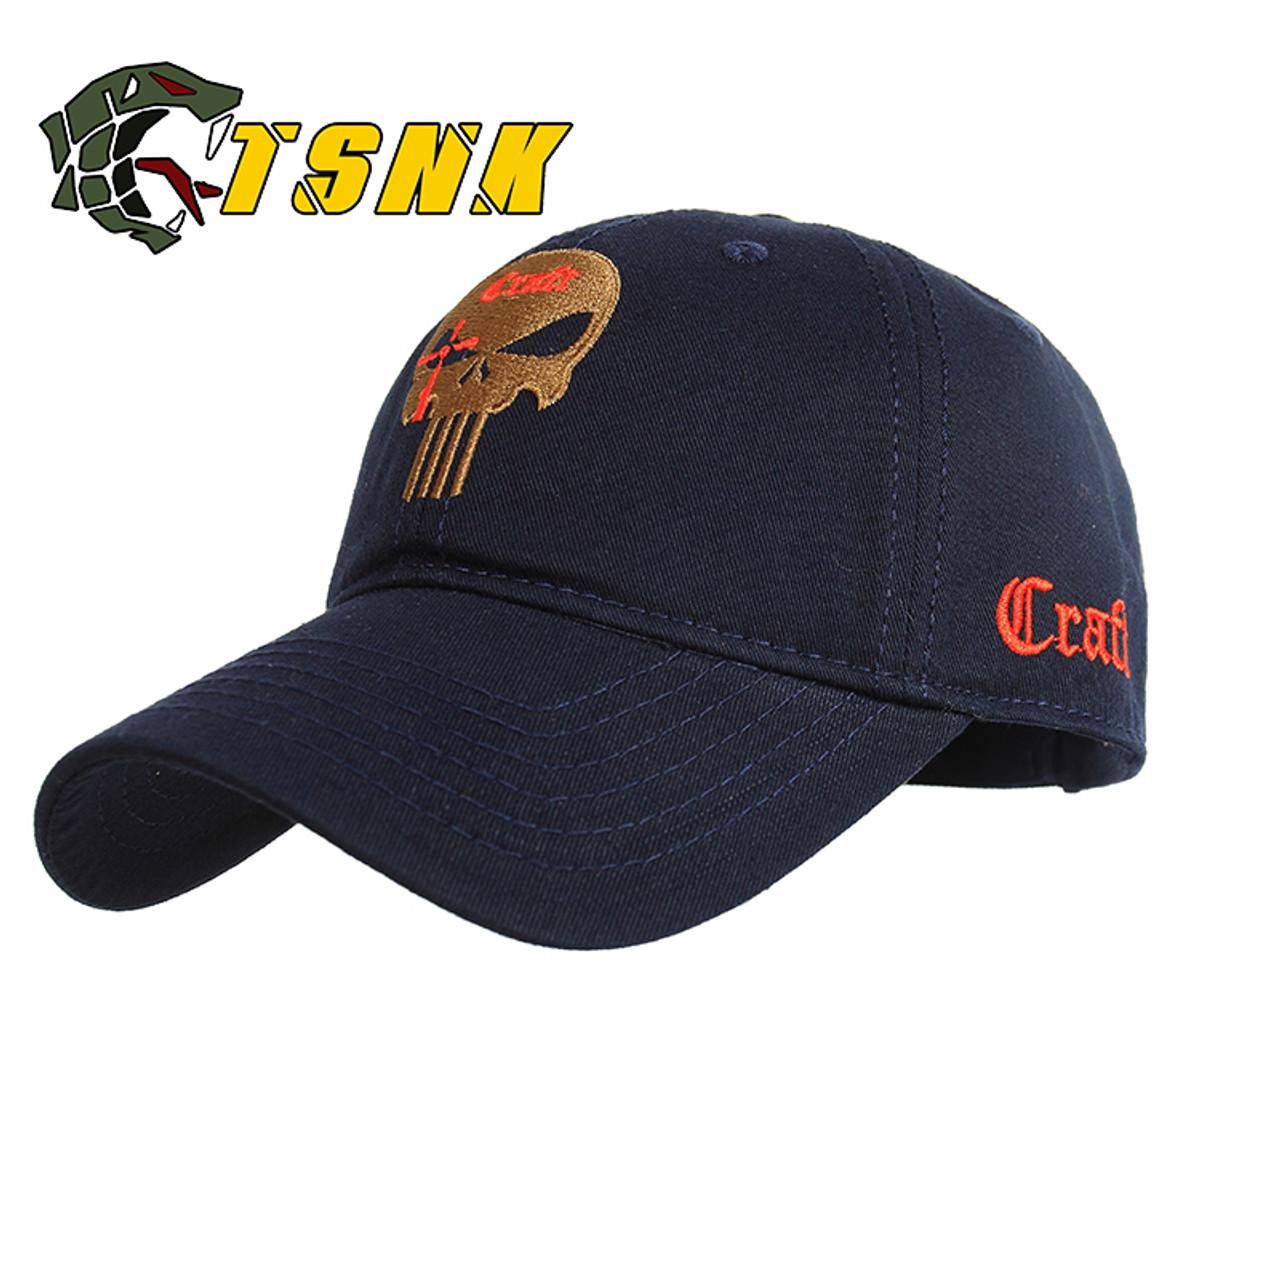 8d3eaf2122b ... TSNK Cotton Baseball Cap branded women men Tactical army caps Seals  Punisher American Sniper baseball hat ...